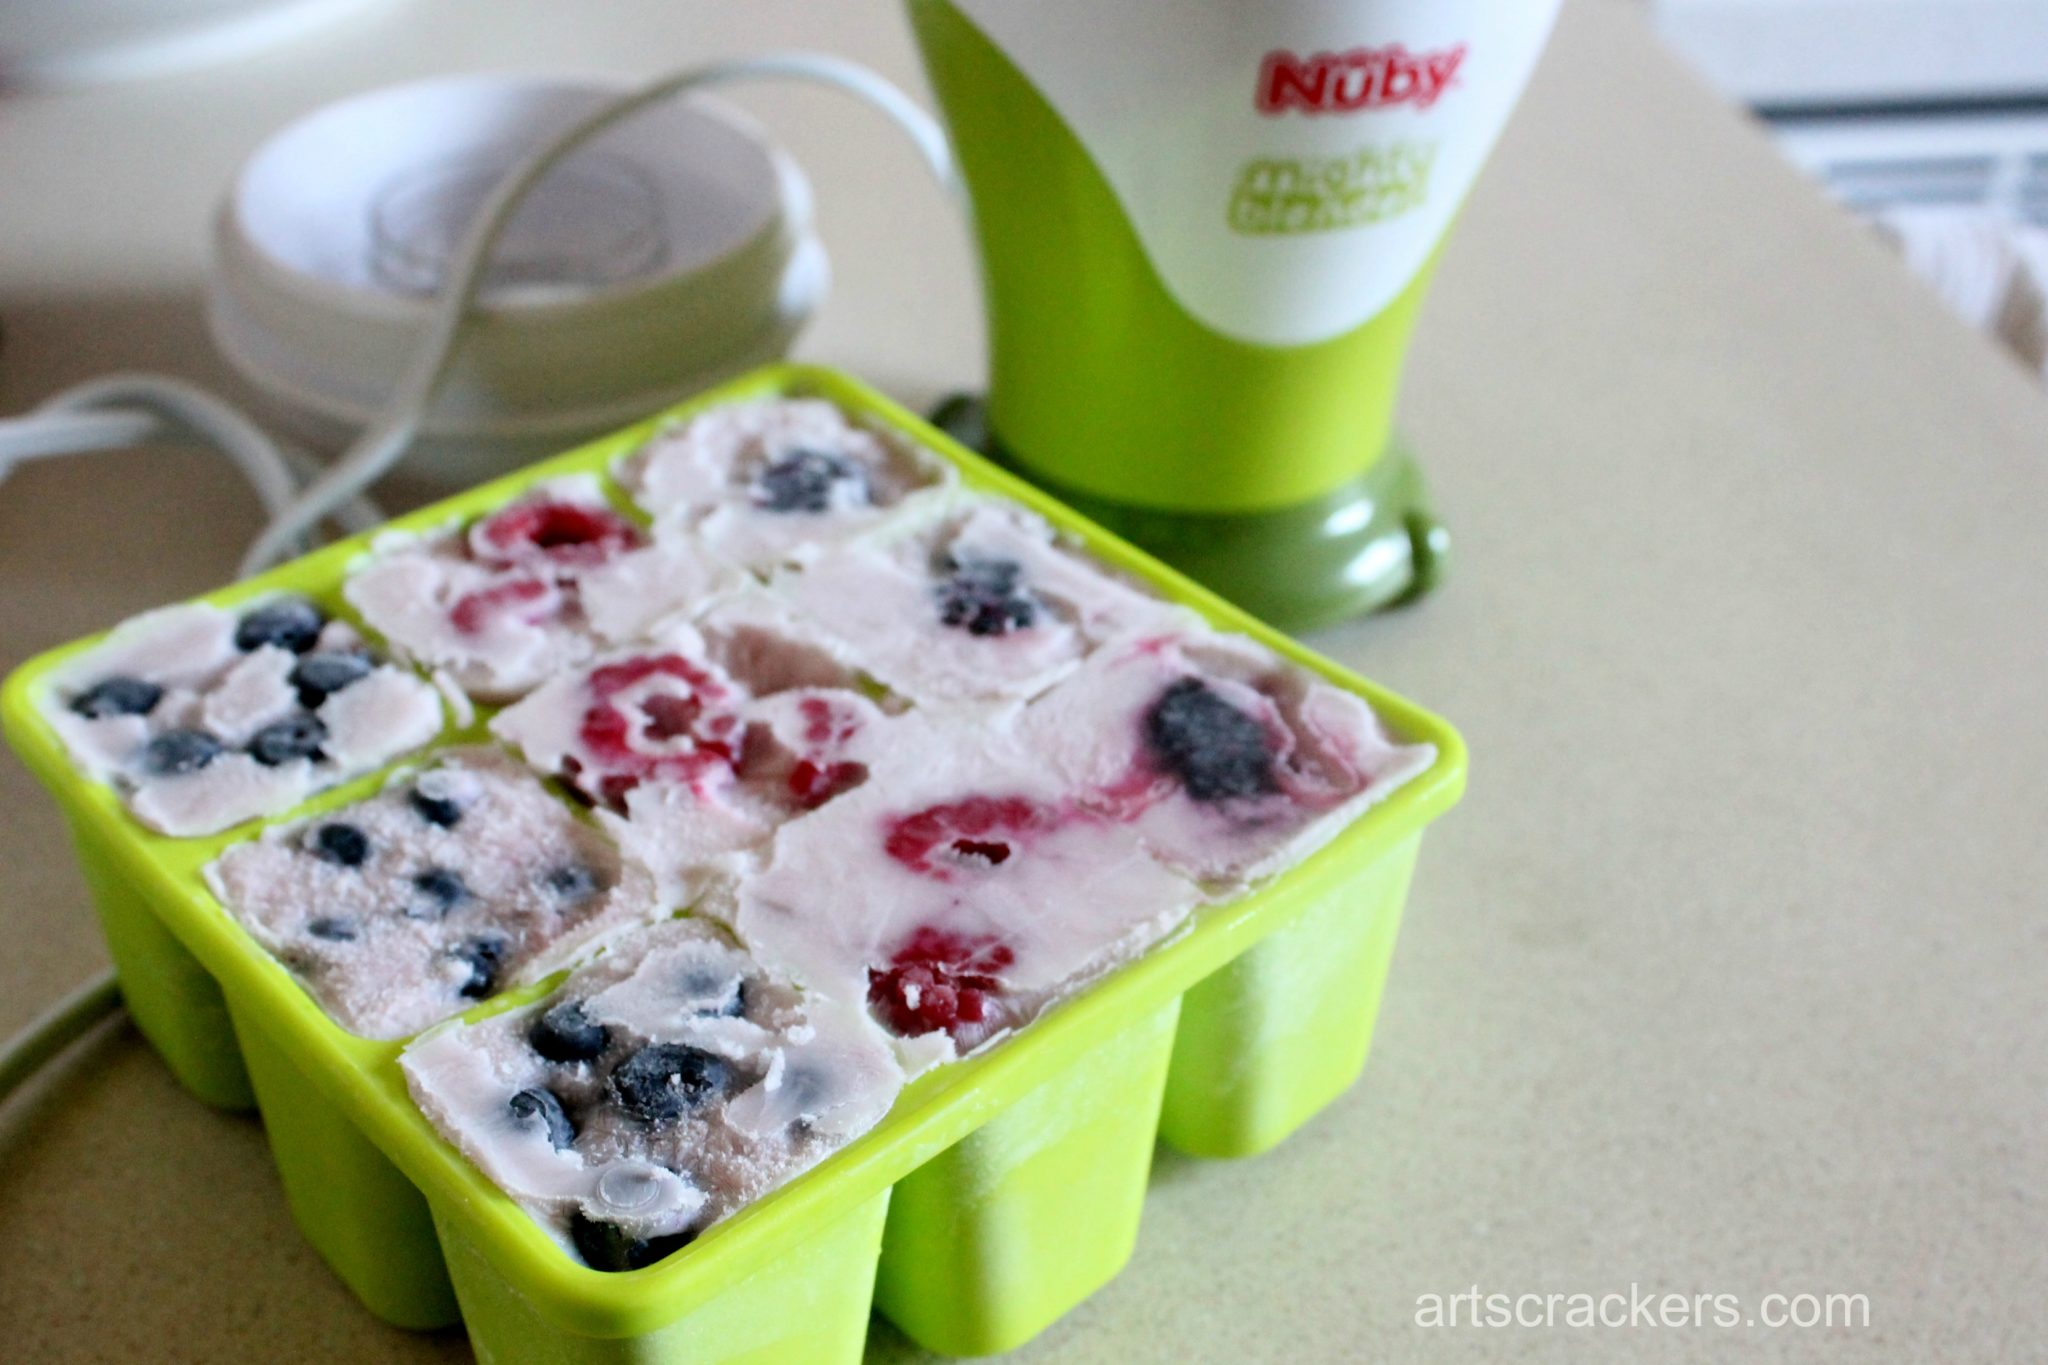 Nuby Garden Fresh Freezer Tray Smoothie Cubes Step 4